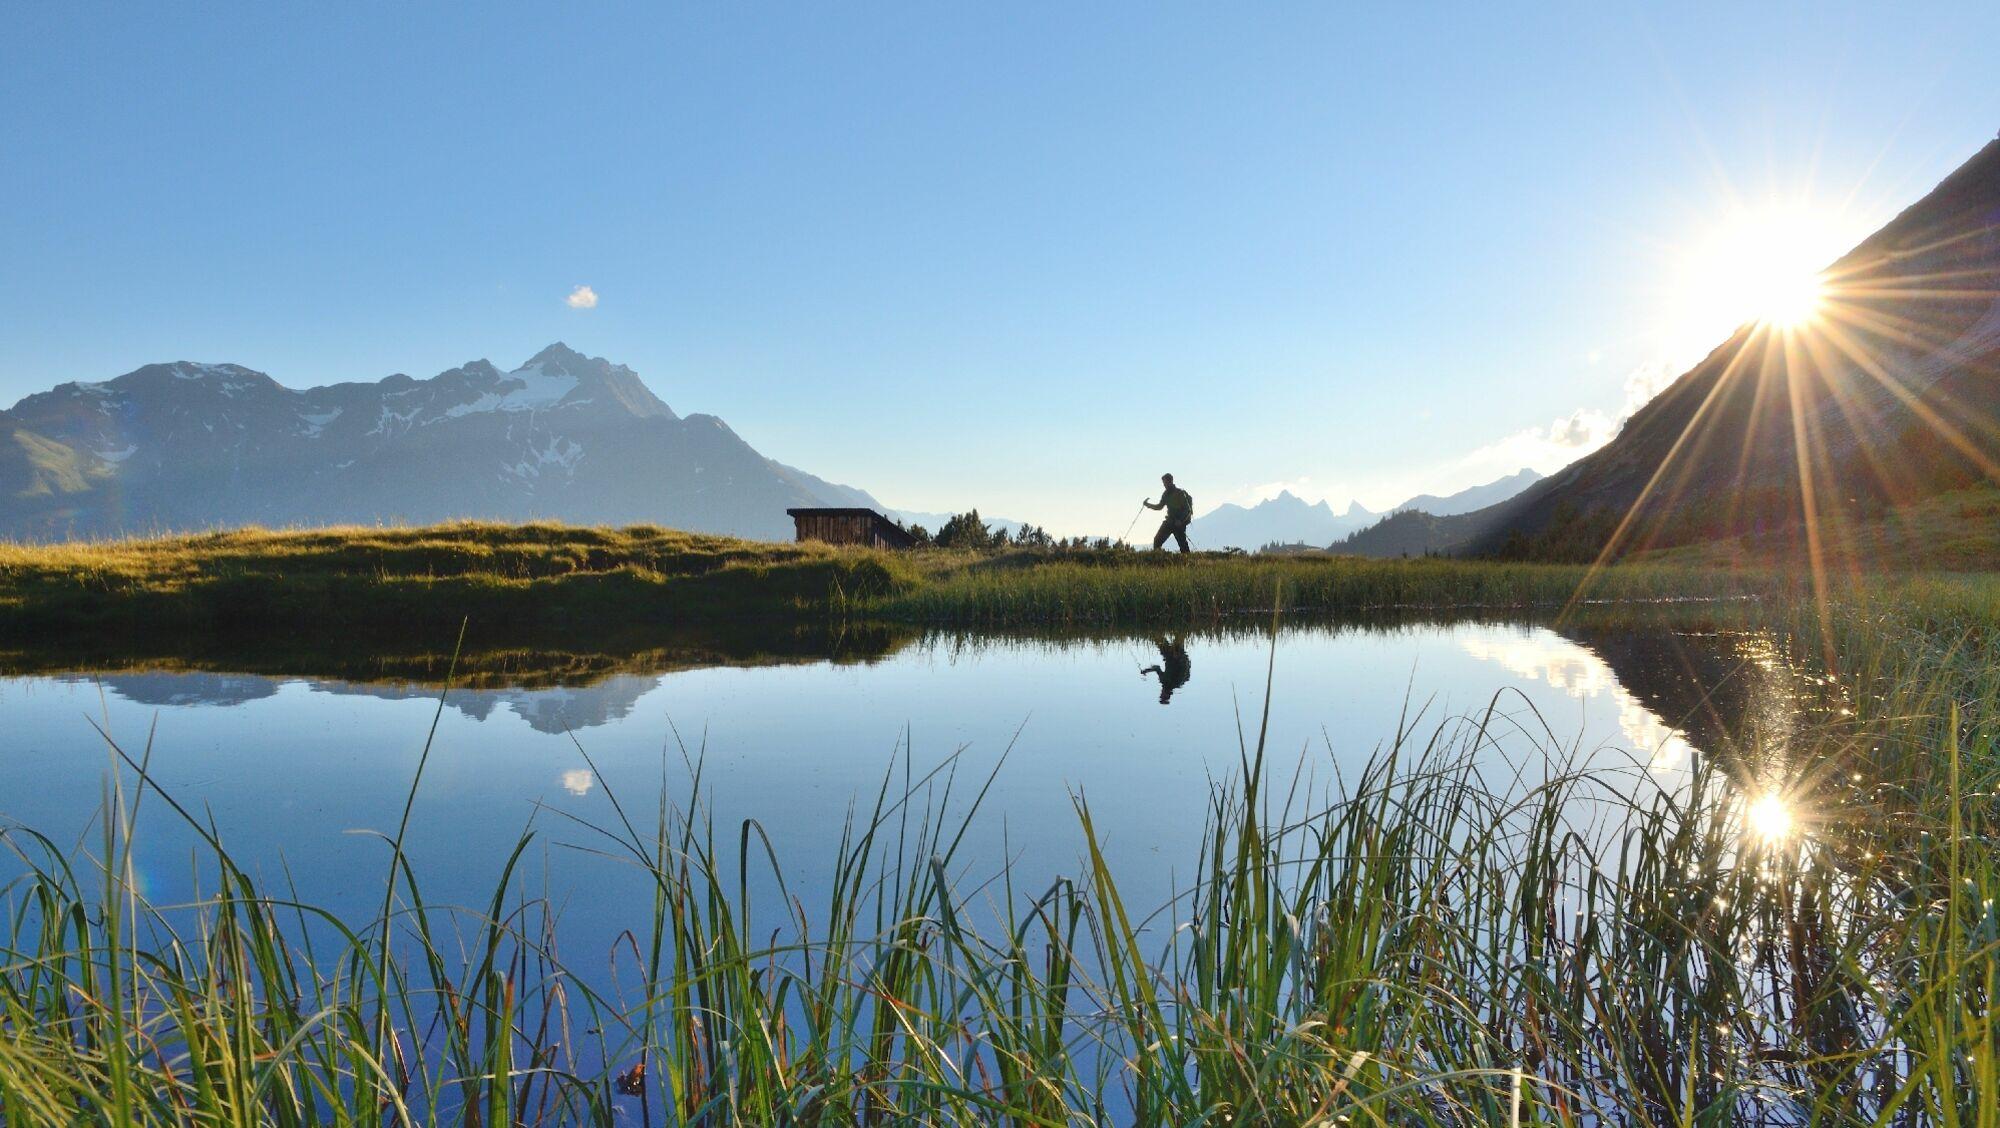 Am 03. Juli startet St. Anton am Arlberg in den Bergsommer